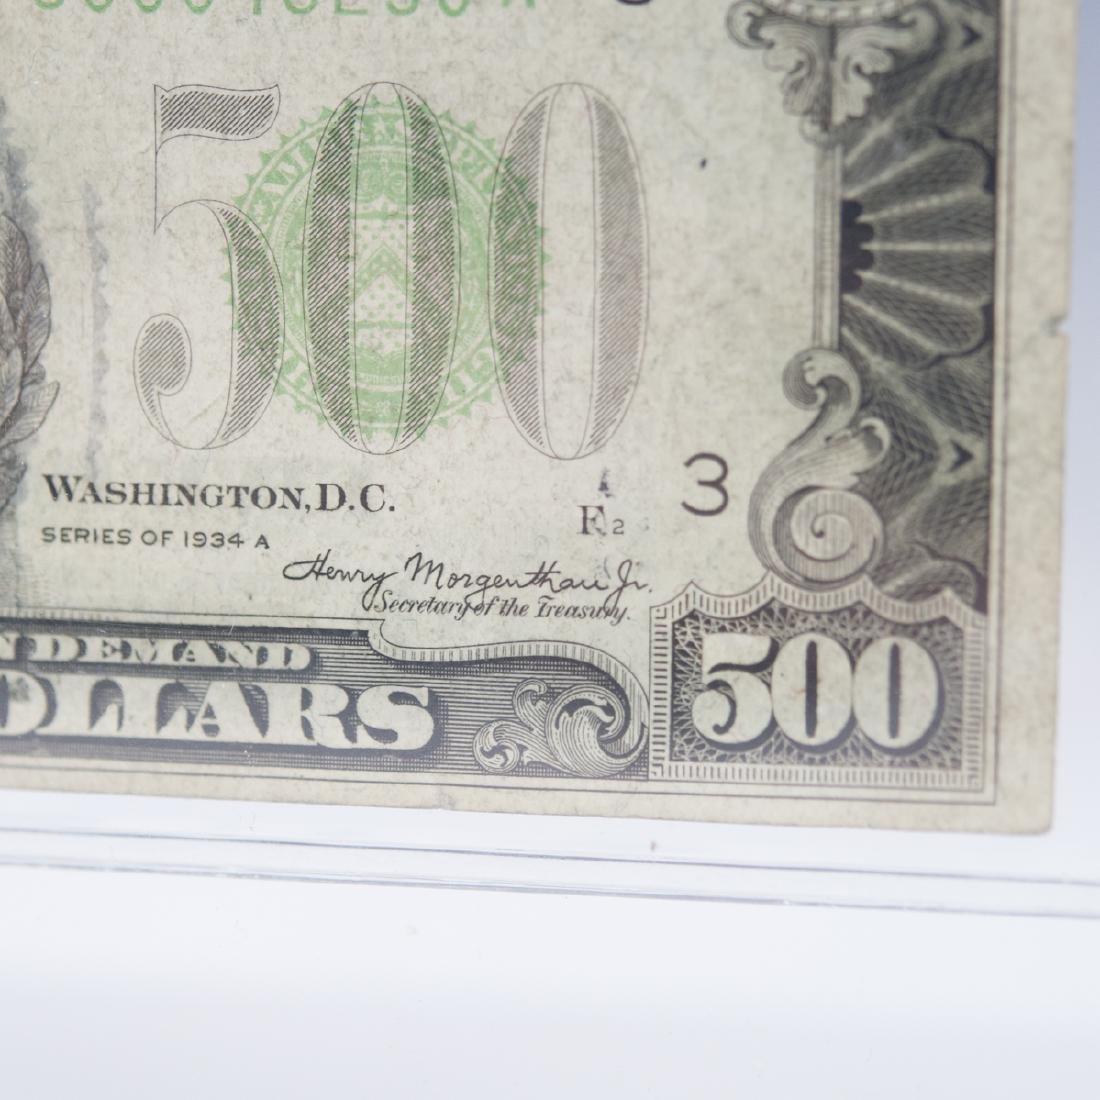 1934 A 500 Dollar Bill - 7